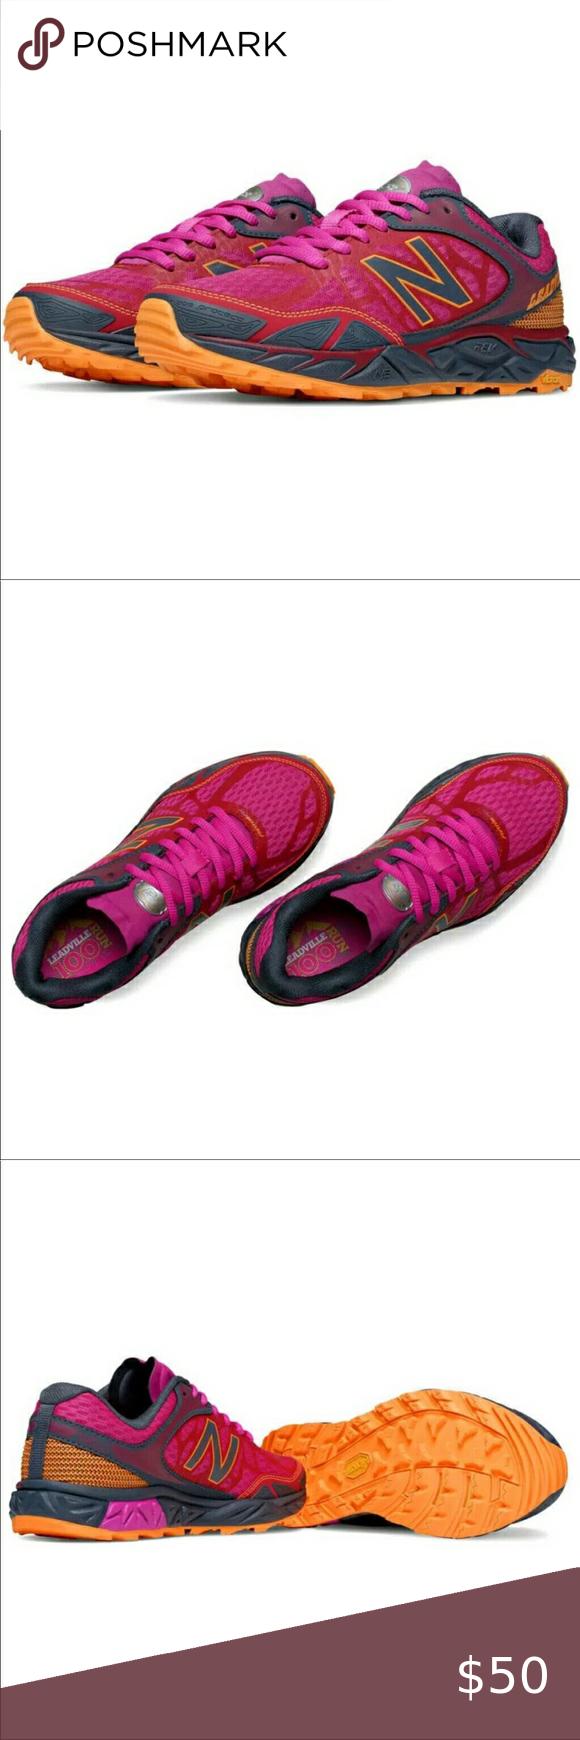 New Balance Women Trail Run Shoes 6 In 2020 New Balance Women Women New Balance Shoes